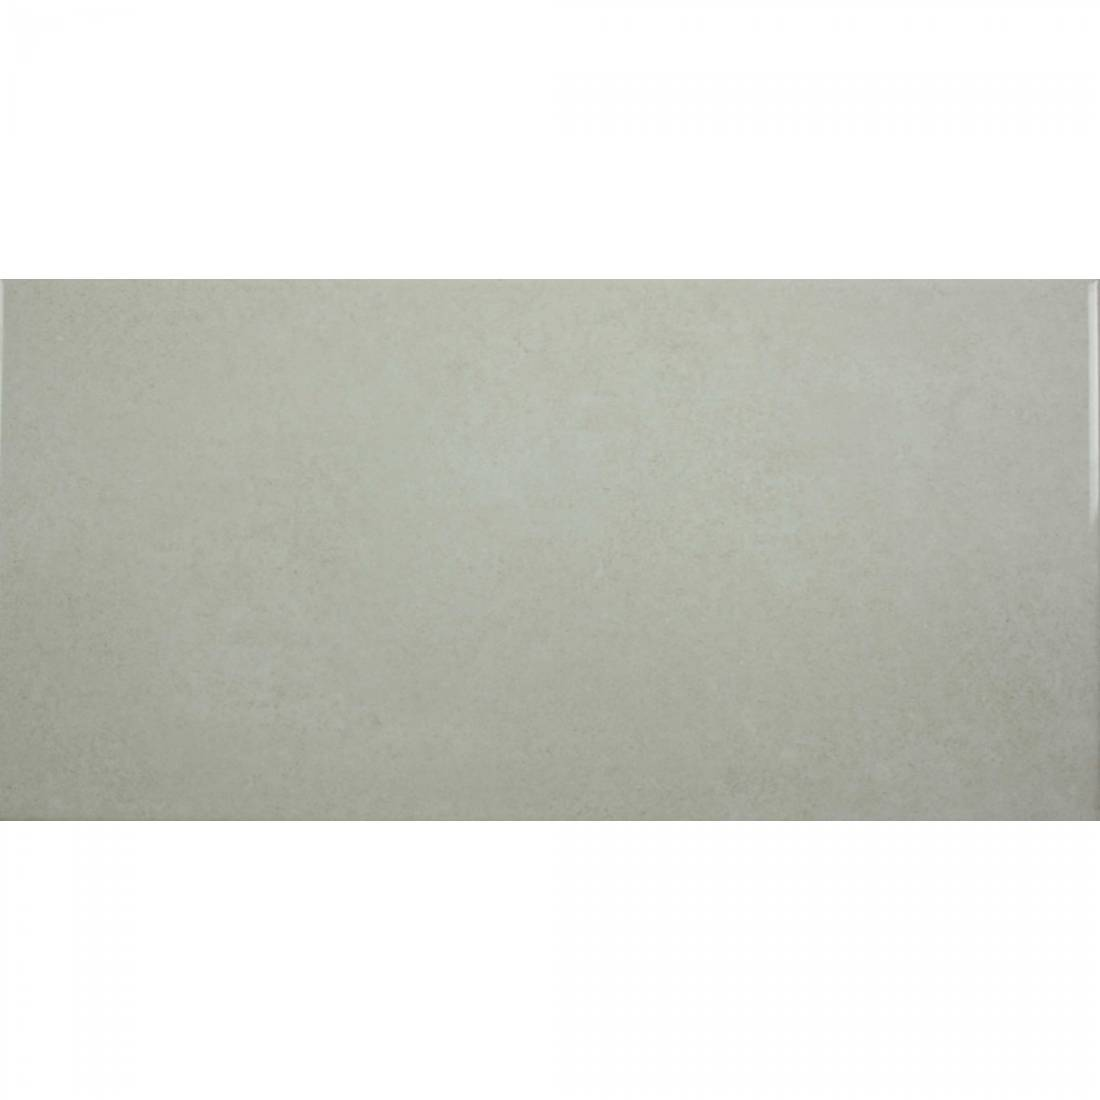 Artemis 25x50 Grey Gloss 1